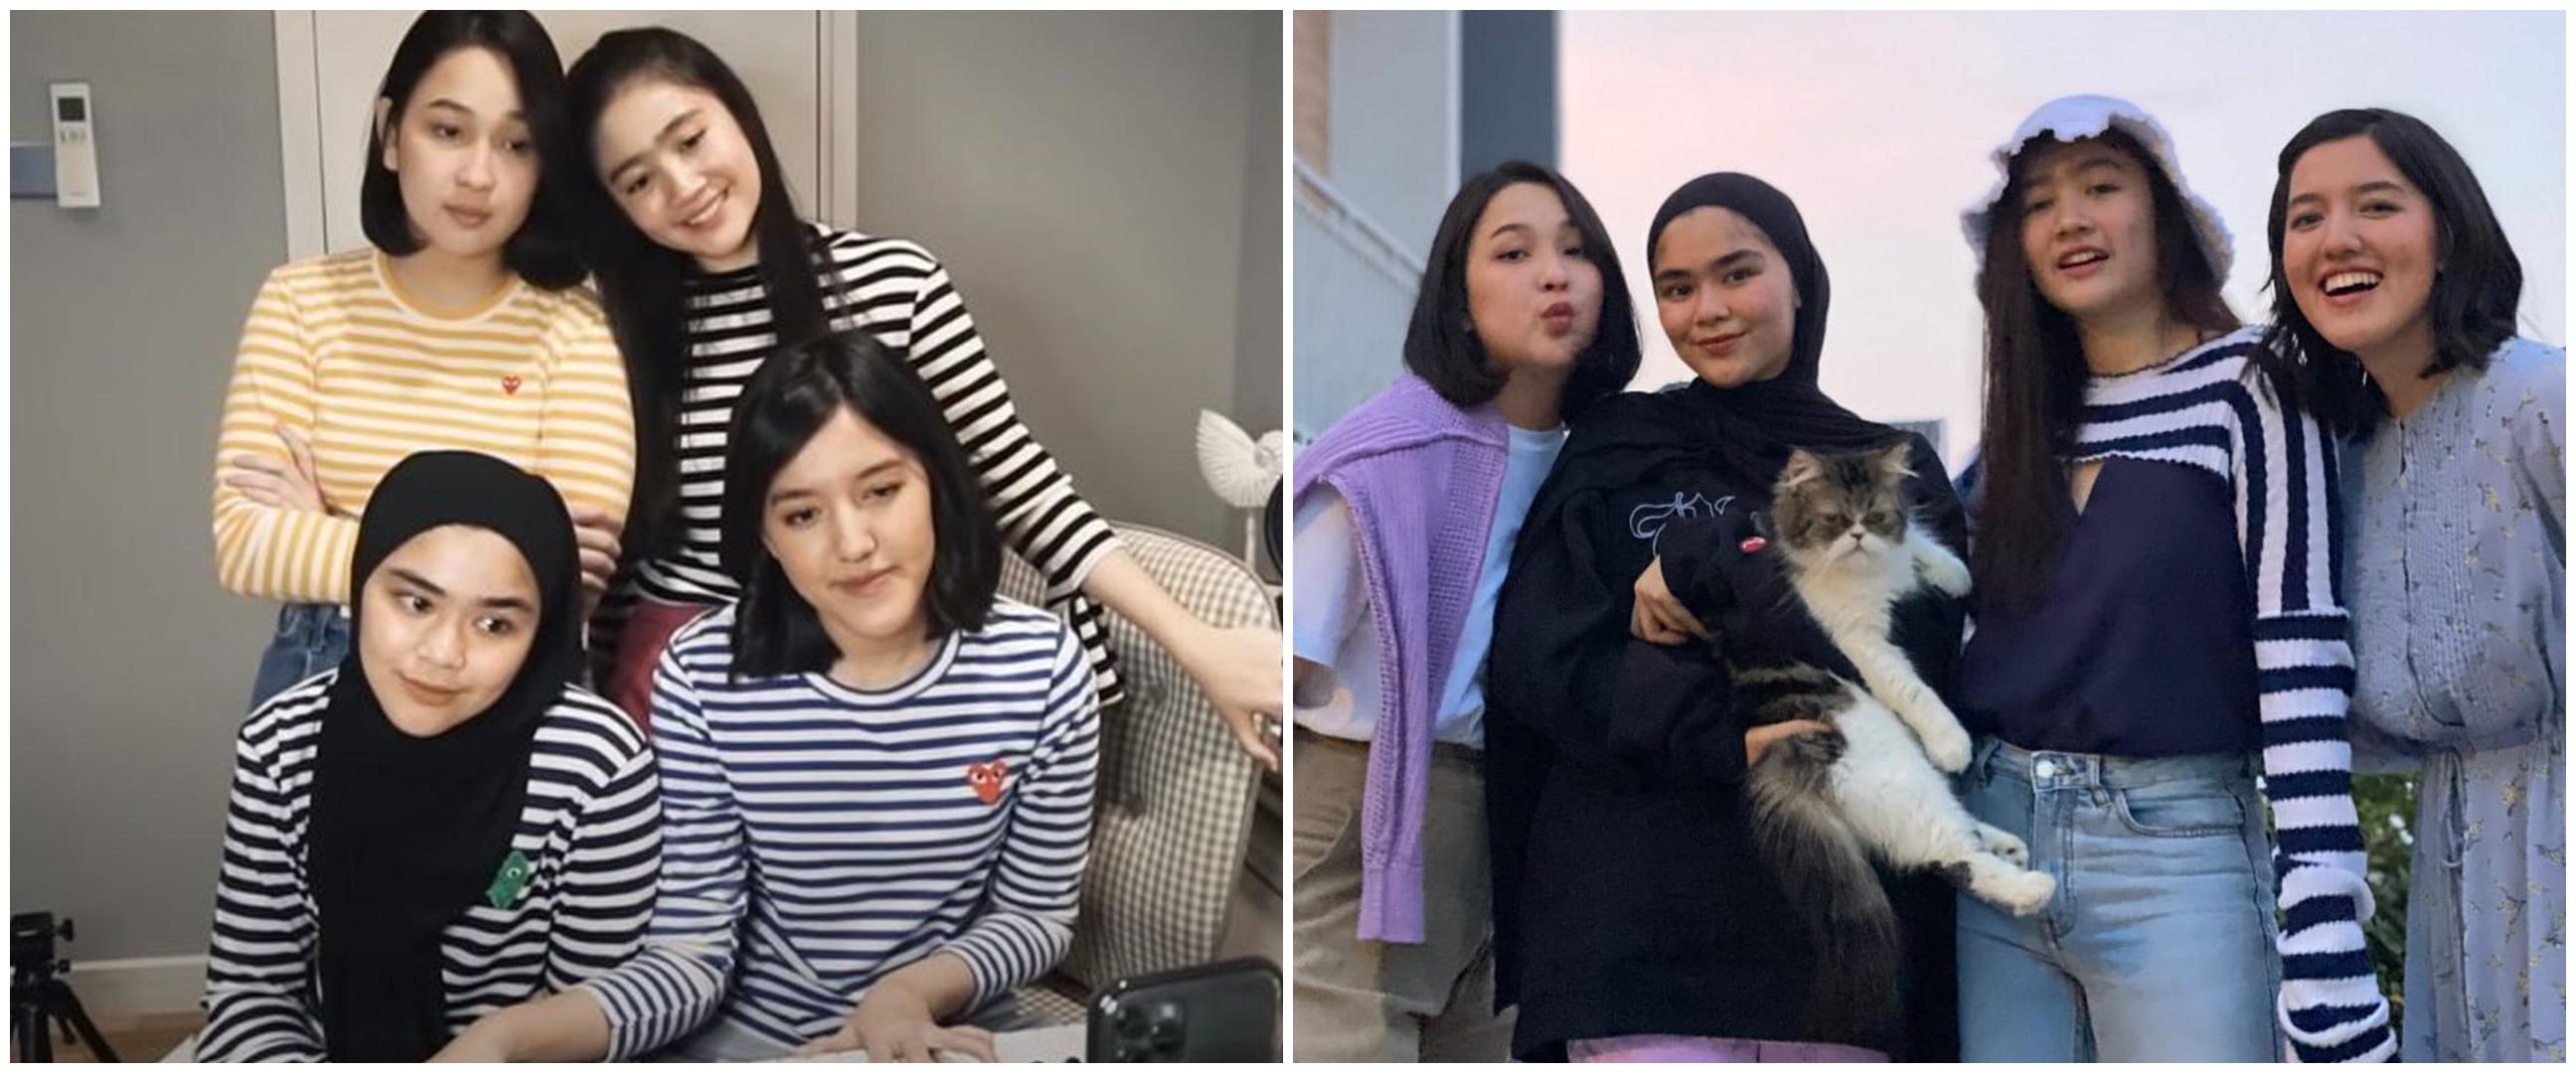 Potret masa kecil vs kini 5 anggota girlband Blink, bikin kaget